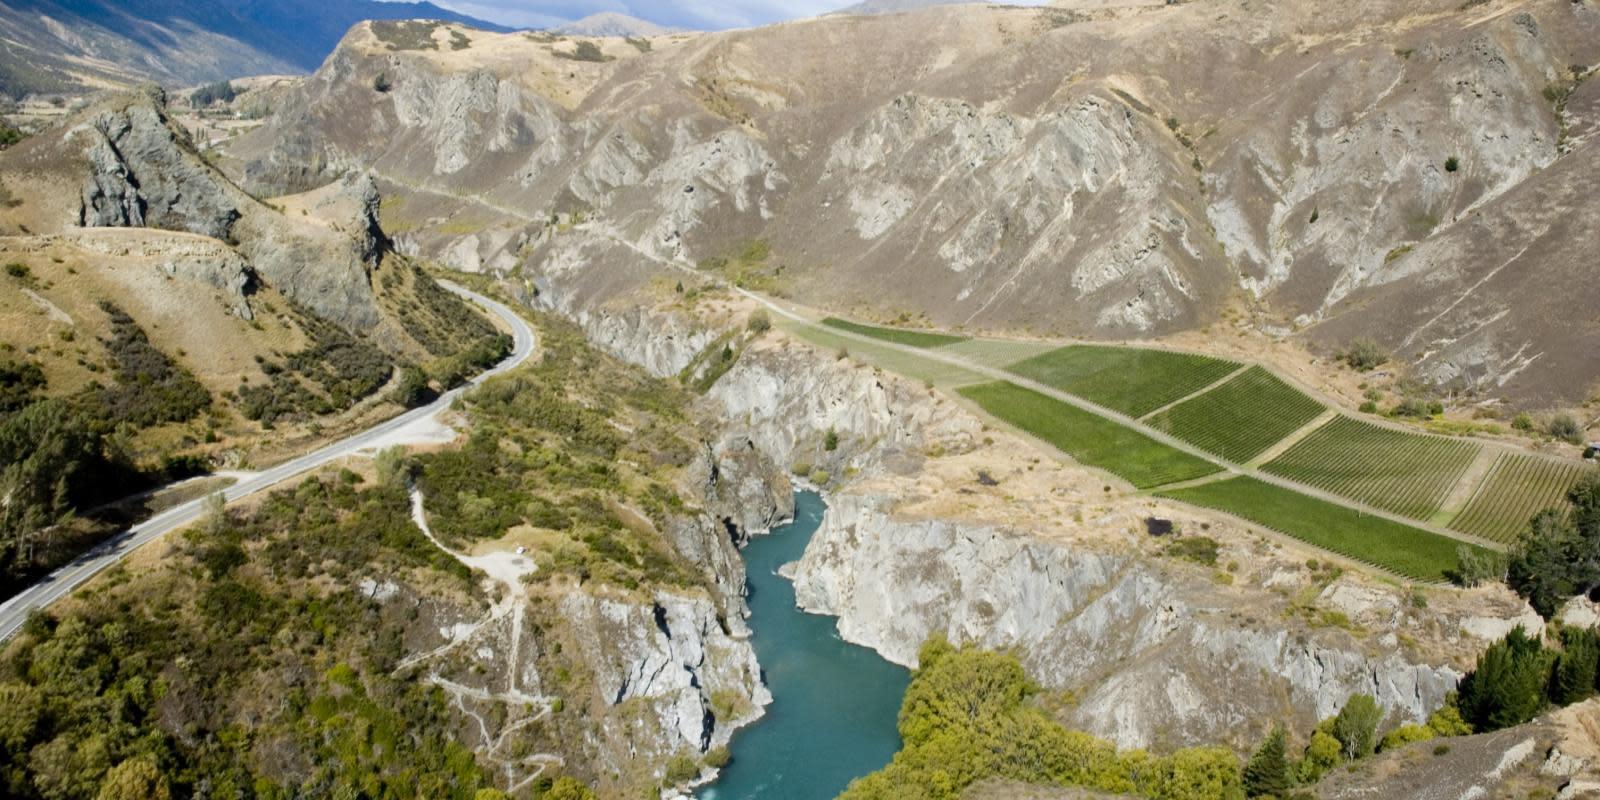 Chard-Farm-Winery-Near-Queenstown-New-Zealand